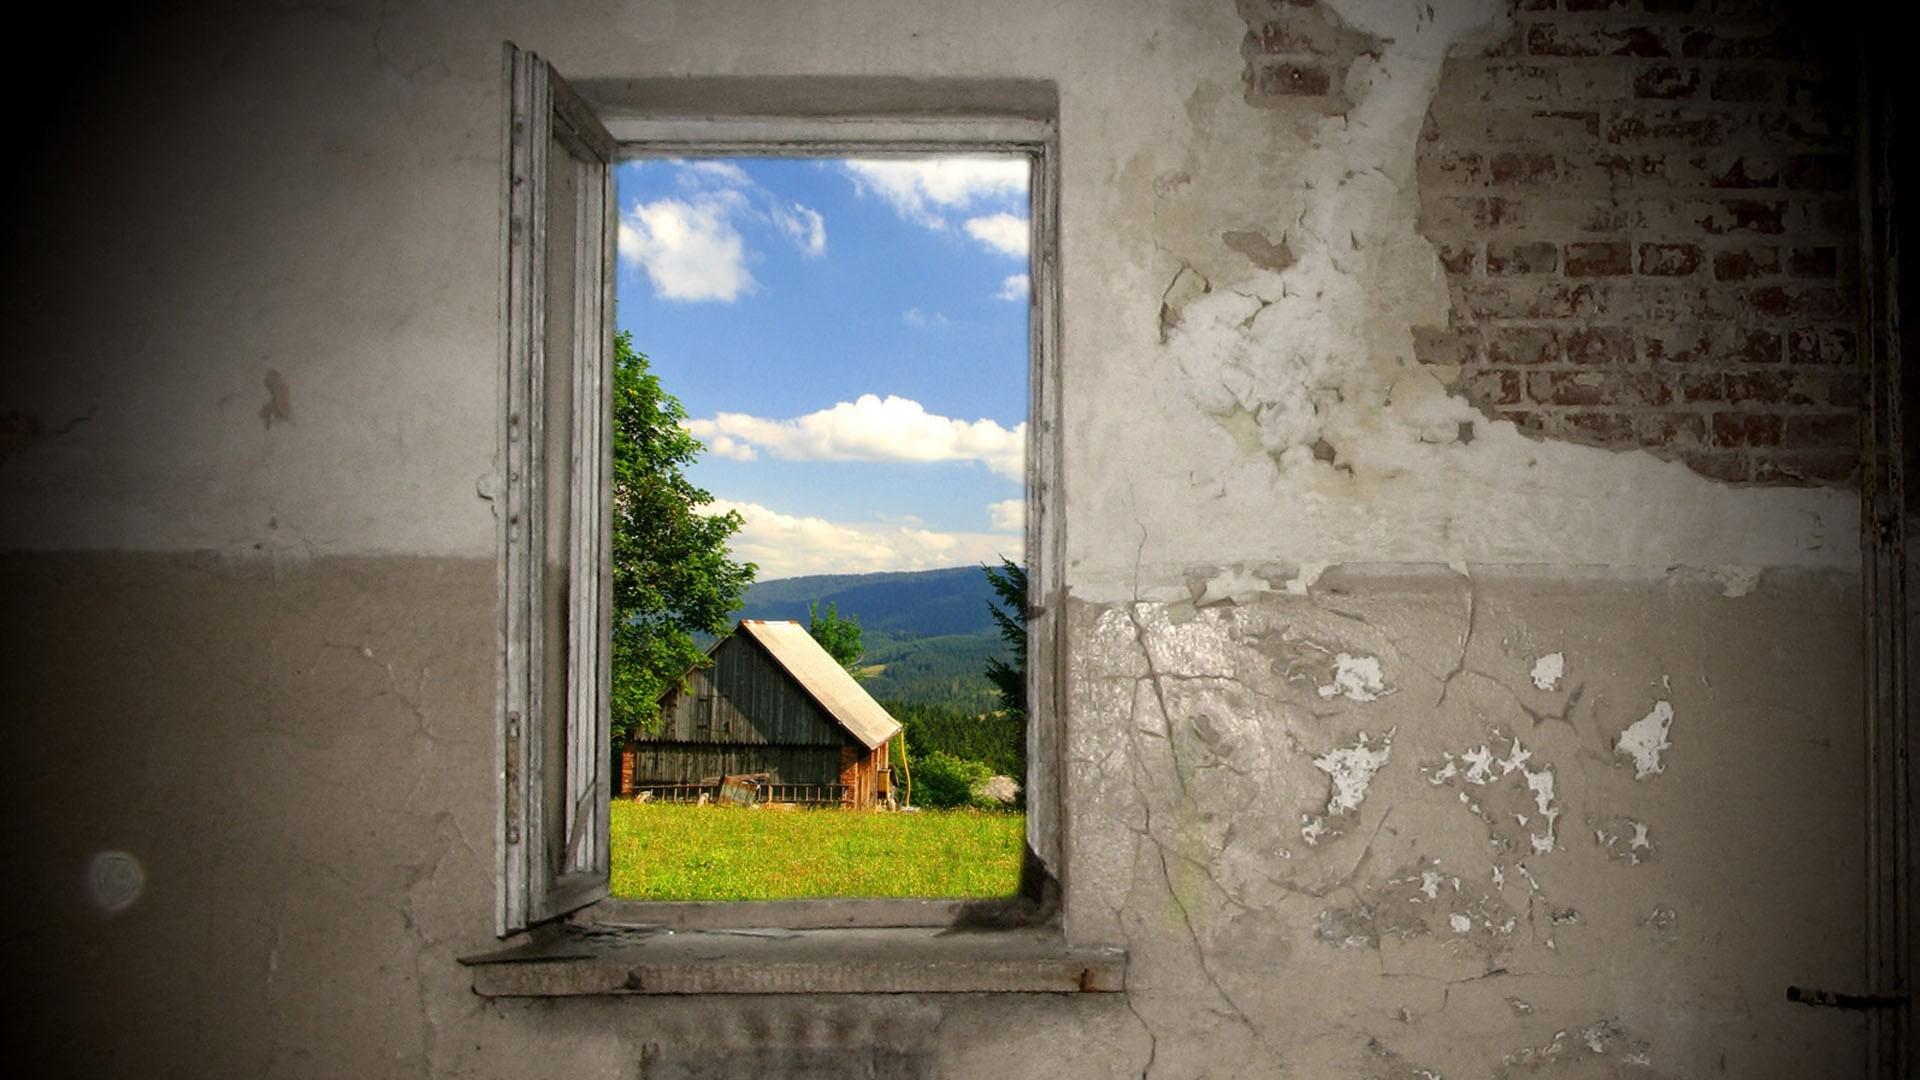 Res: 1920x1080, Man Made - Window Wallpaper